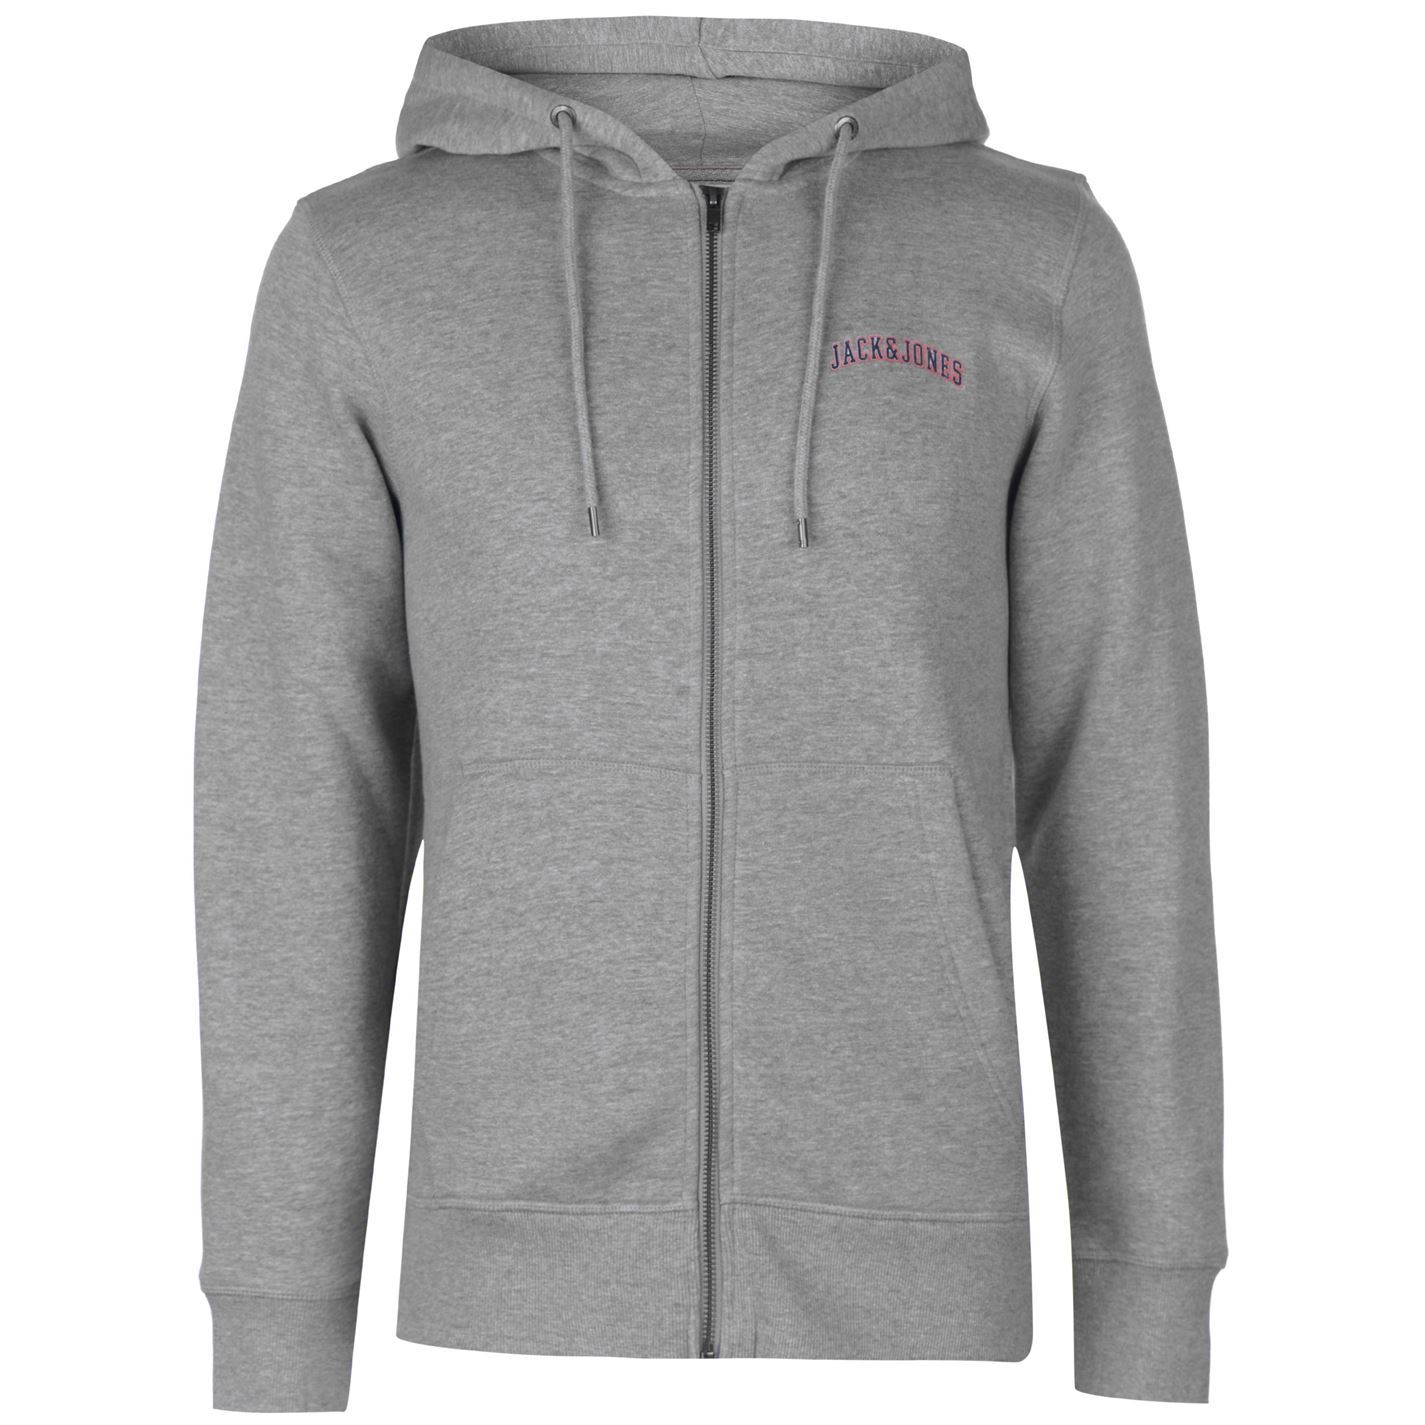 Jack-and-Jones-Originals-Harvey-Zip-Hoodie-Mens-Hooded-Top-Sweater-Outerwear thumbnail 4